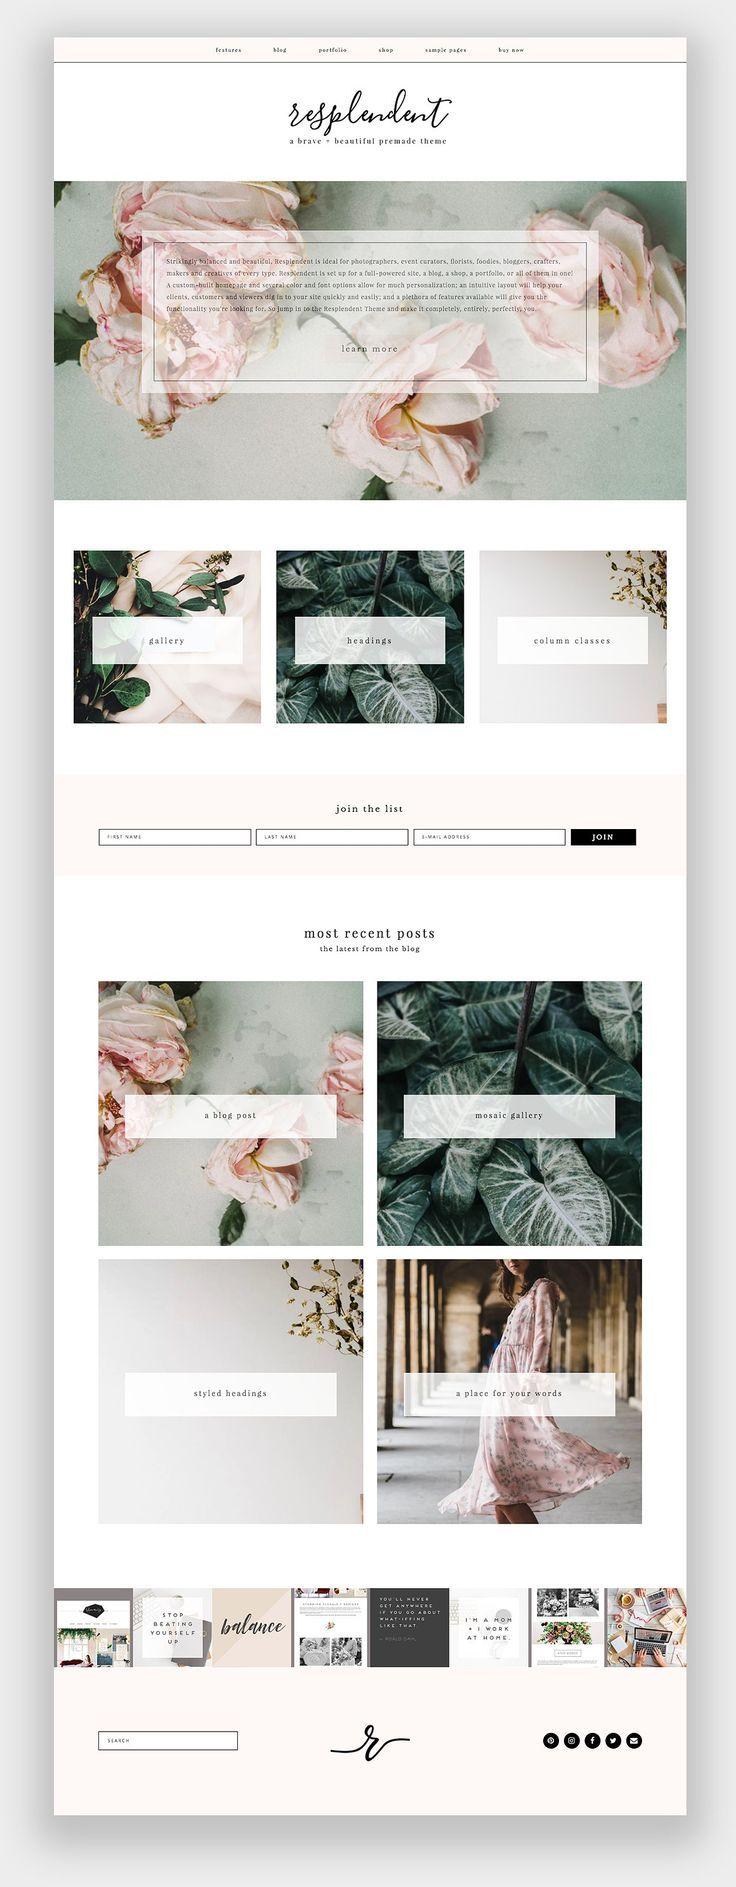 Resplendent Wordpress Theme Photography #wordpress #theme #feminine #simple #portfolio